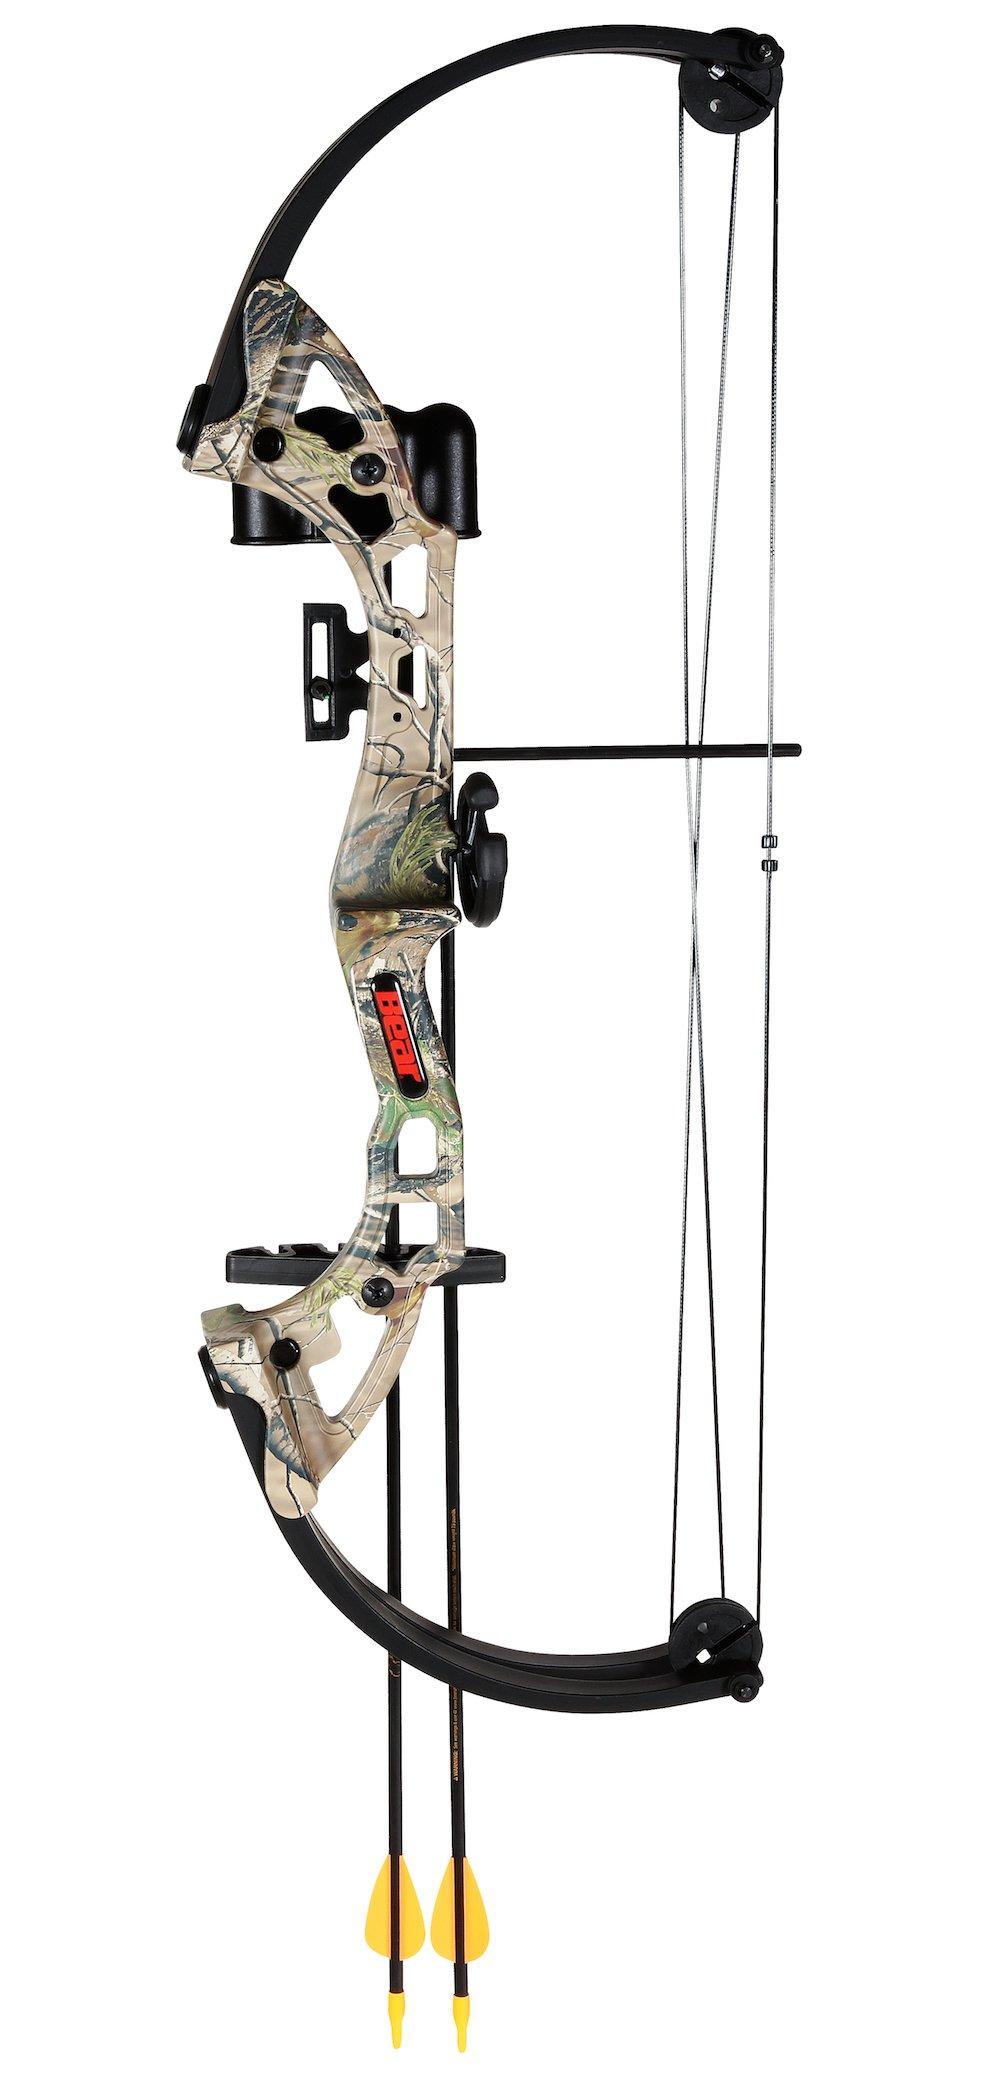 Bear Archery Brave camo w/ biscuit RH BAAYS300CR